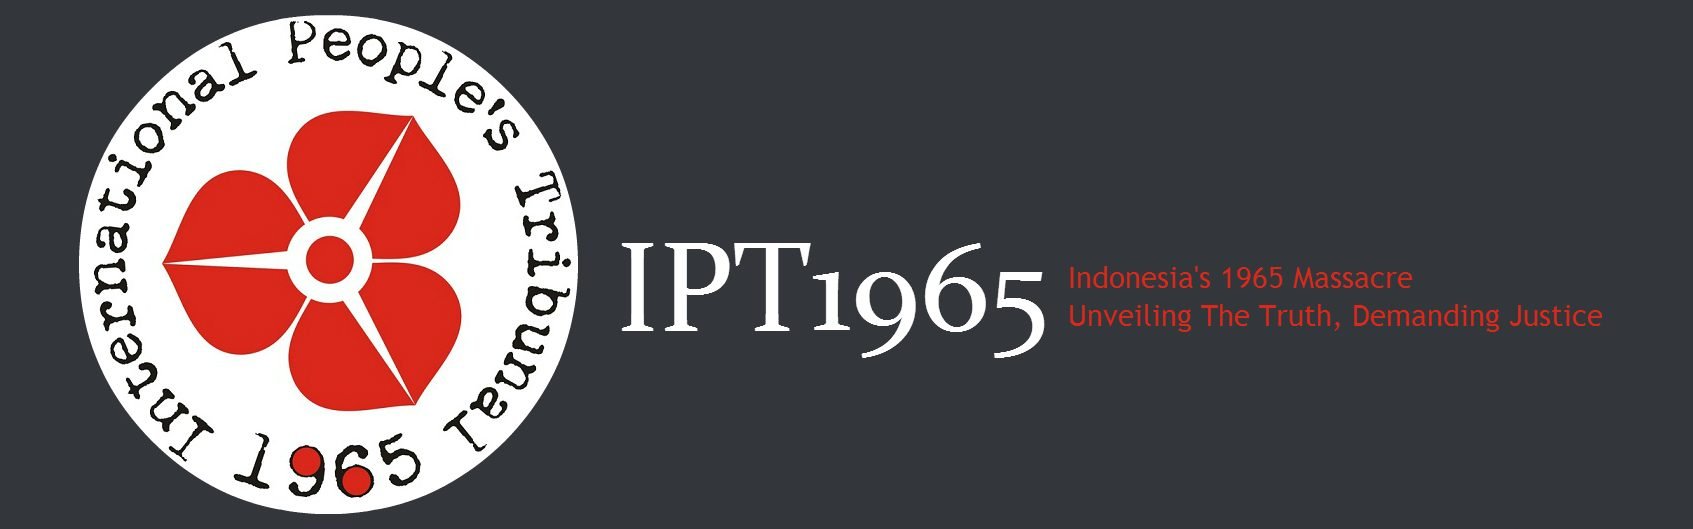 cropped-LogoIPT1965-1.jpg